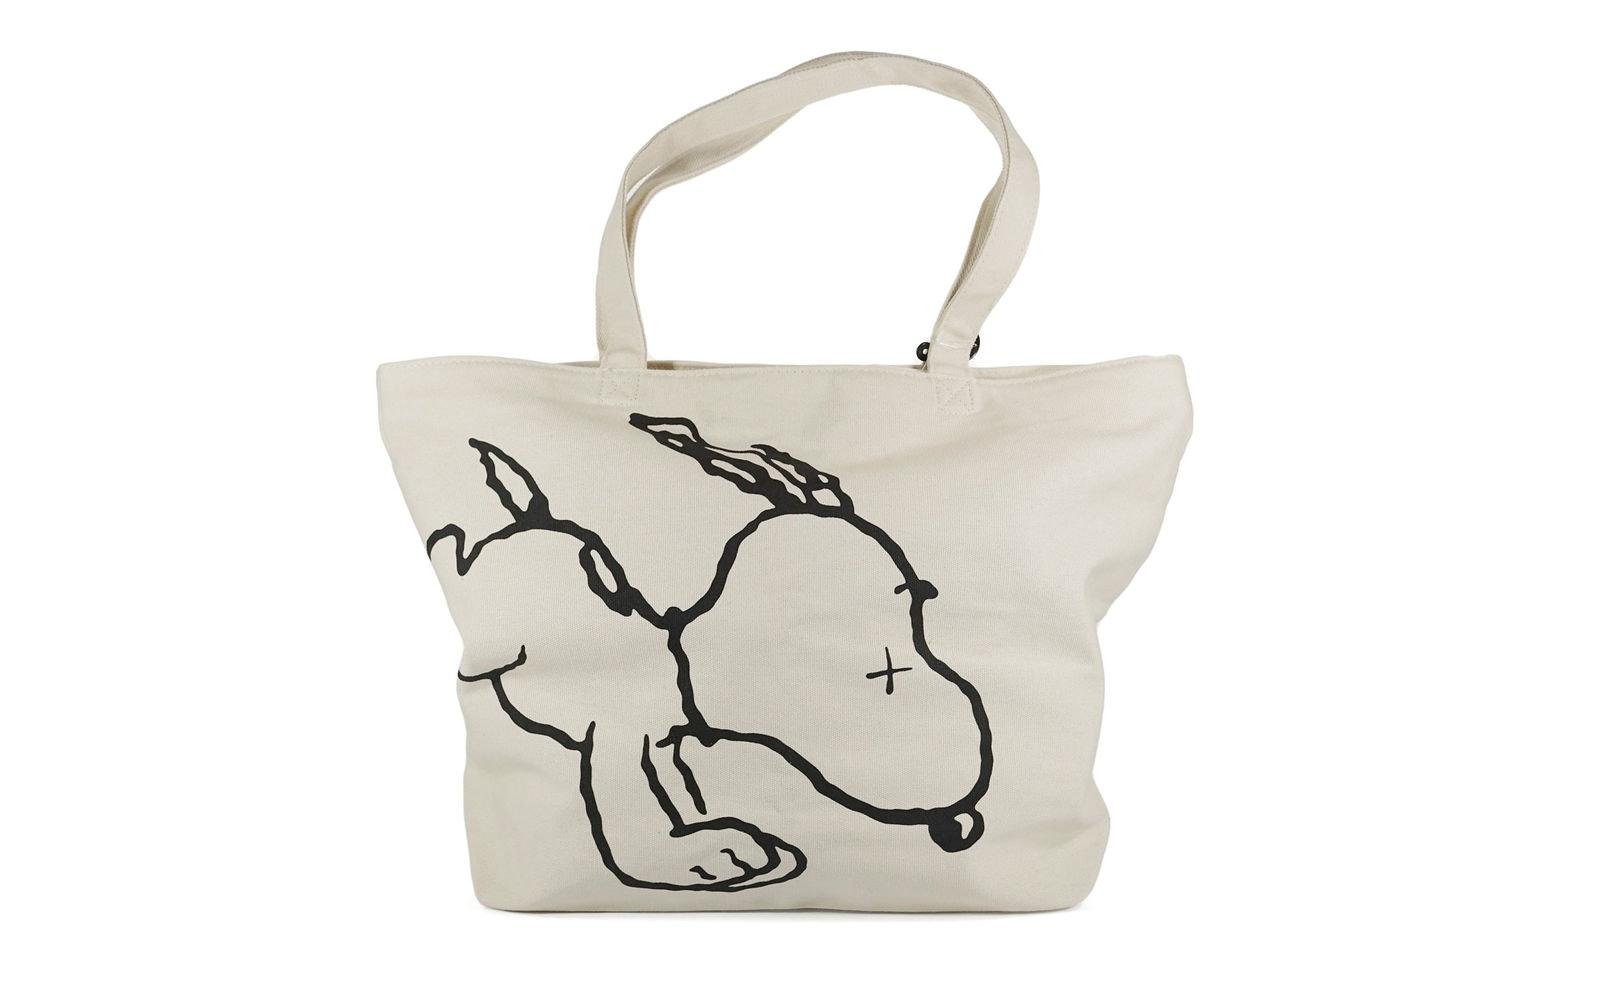 Kaws x Uniqlo x Peanuts Snoopy Tote Bag Beige